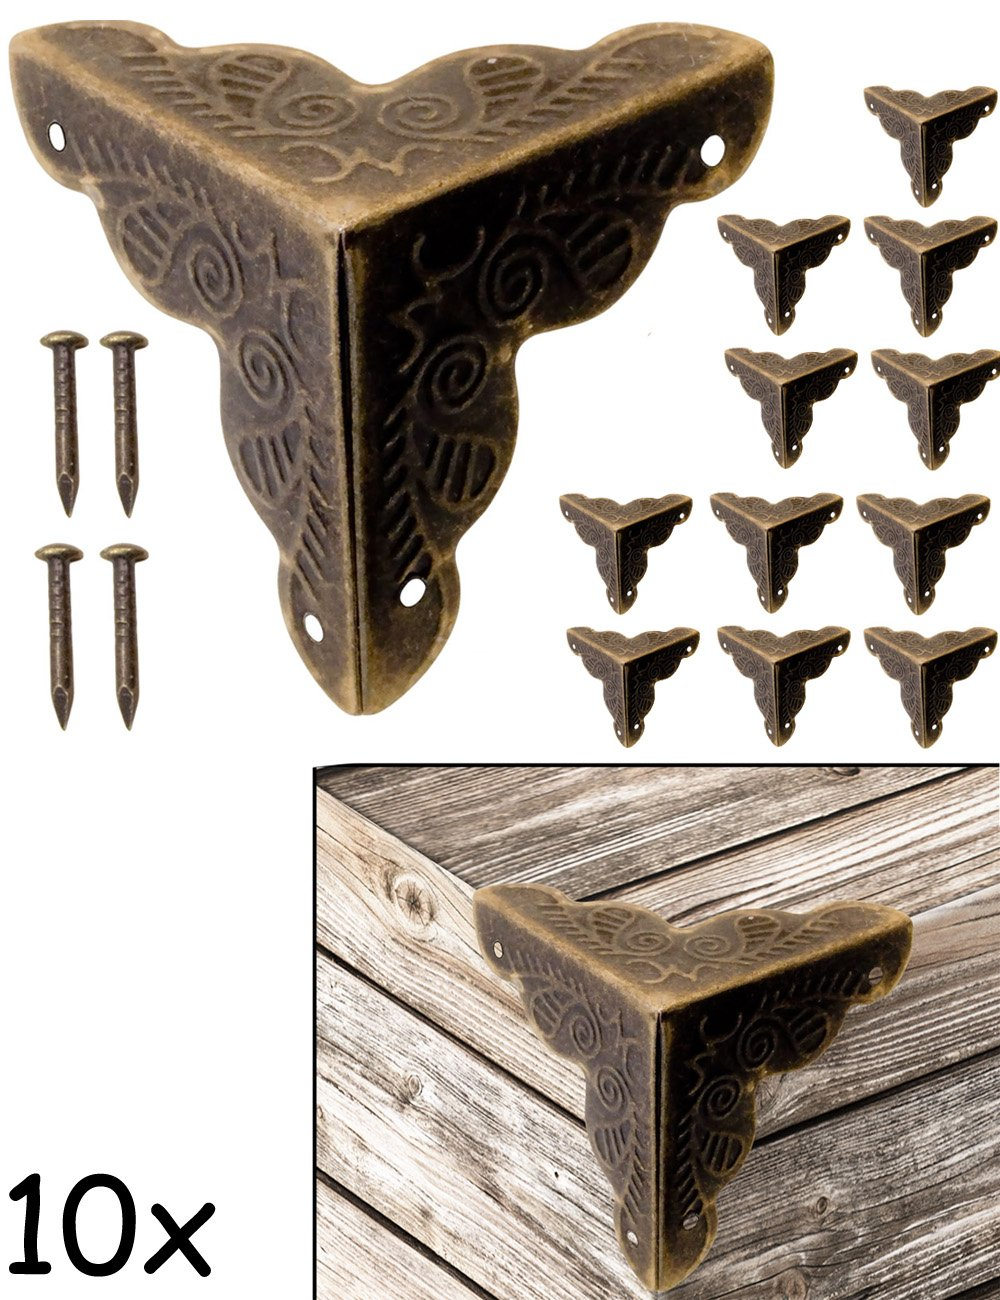 fuxxer 10x antik m bel ecken beschl ge f r kisten. Black Bedroom Furniture Sets. Home Design Ideas